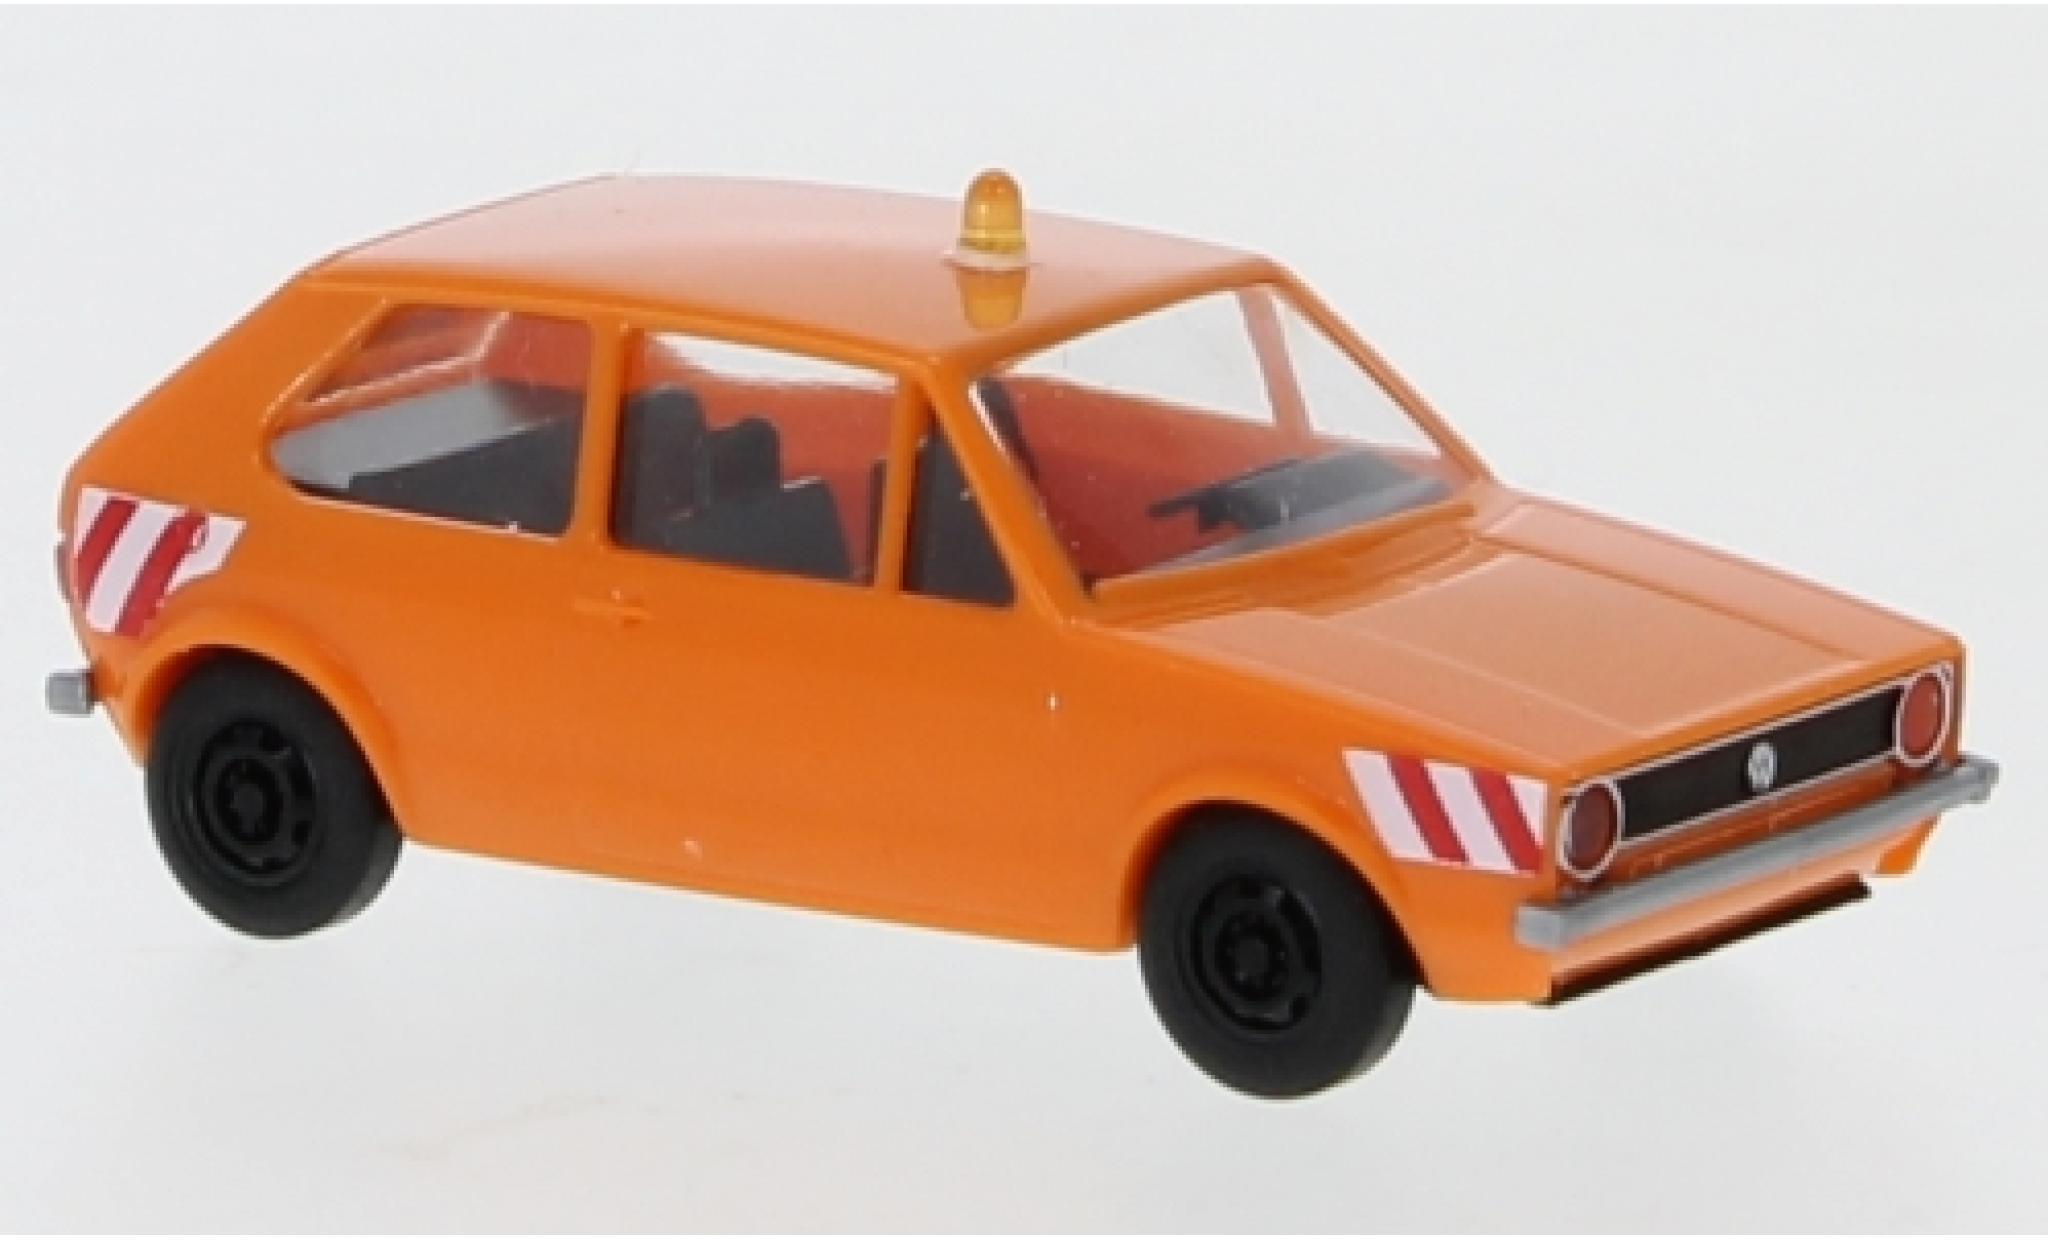 Volkswagen Golf 1/87 Brekina I Kommunal 1974